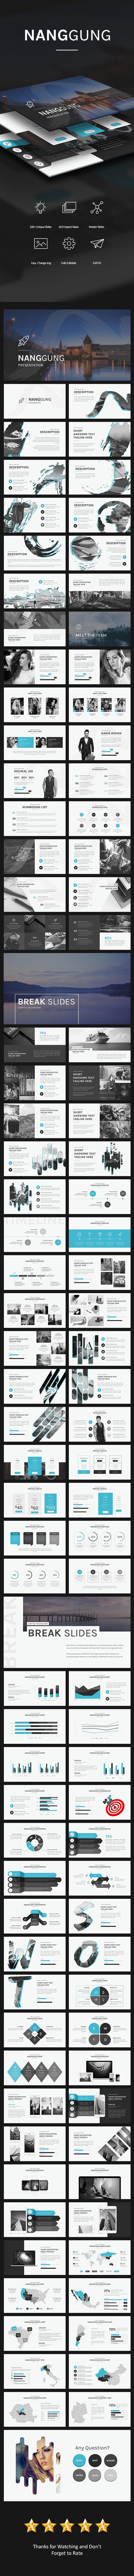 Nanggung Powerpoint - PowerPoint Templates Presentation Templates